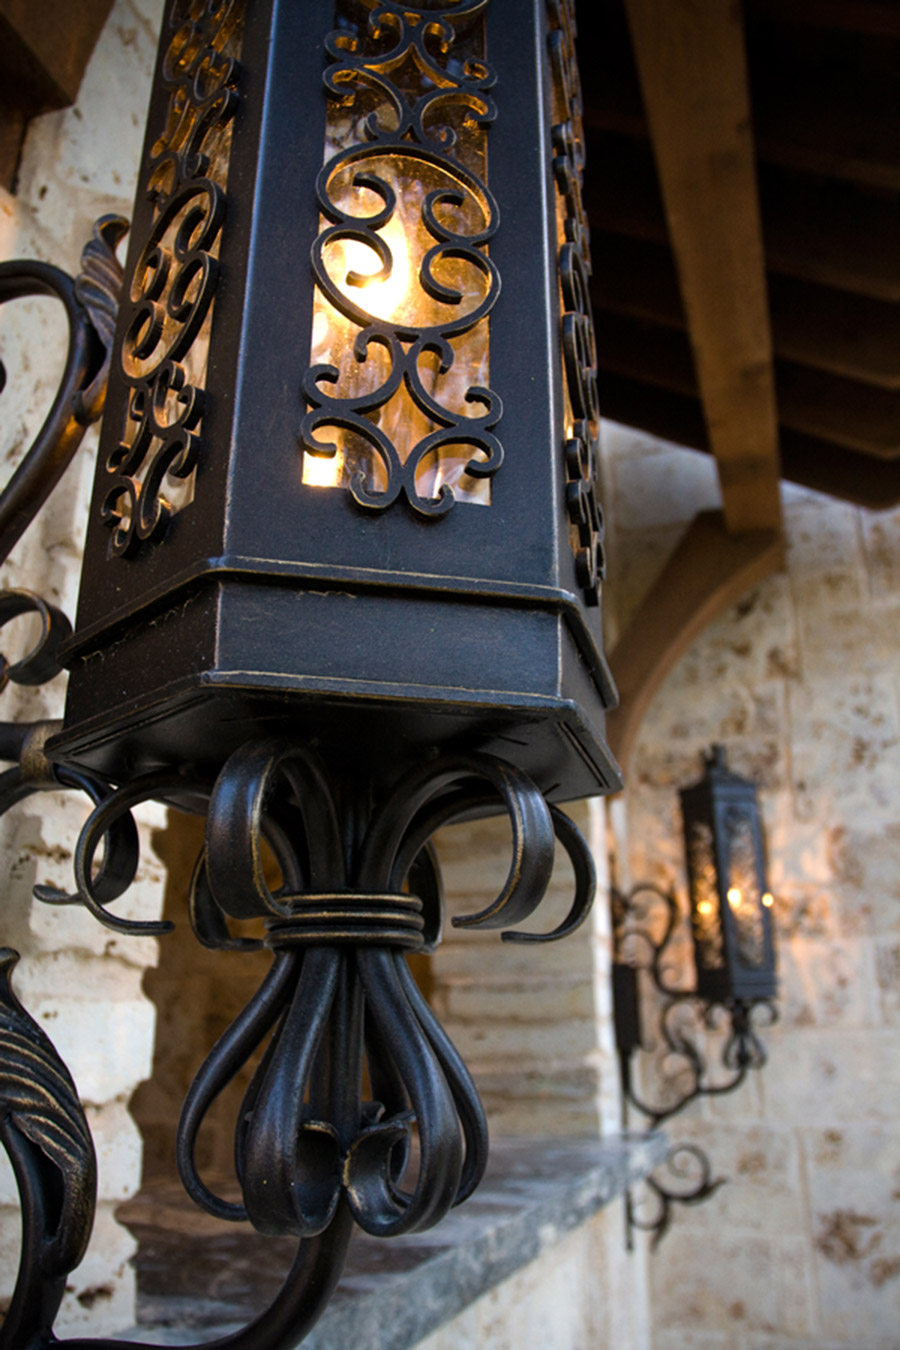 Victory-iron-lighting-fixture-foyer-hall-pendant-entry-kitchen-solara-ligthing-E007-013-EL-(10)